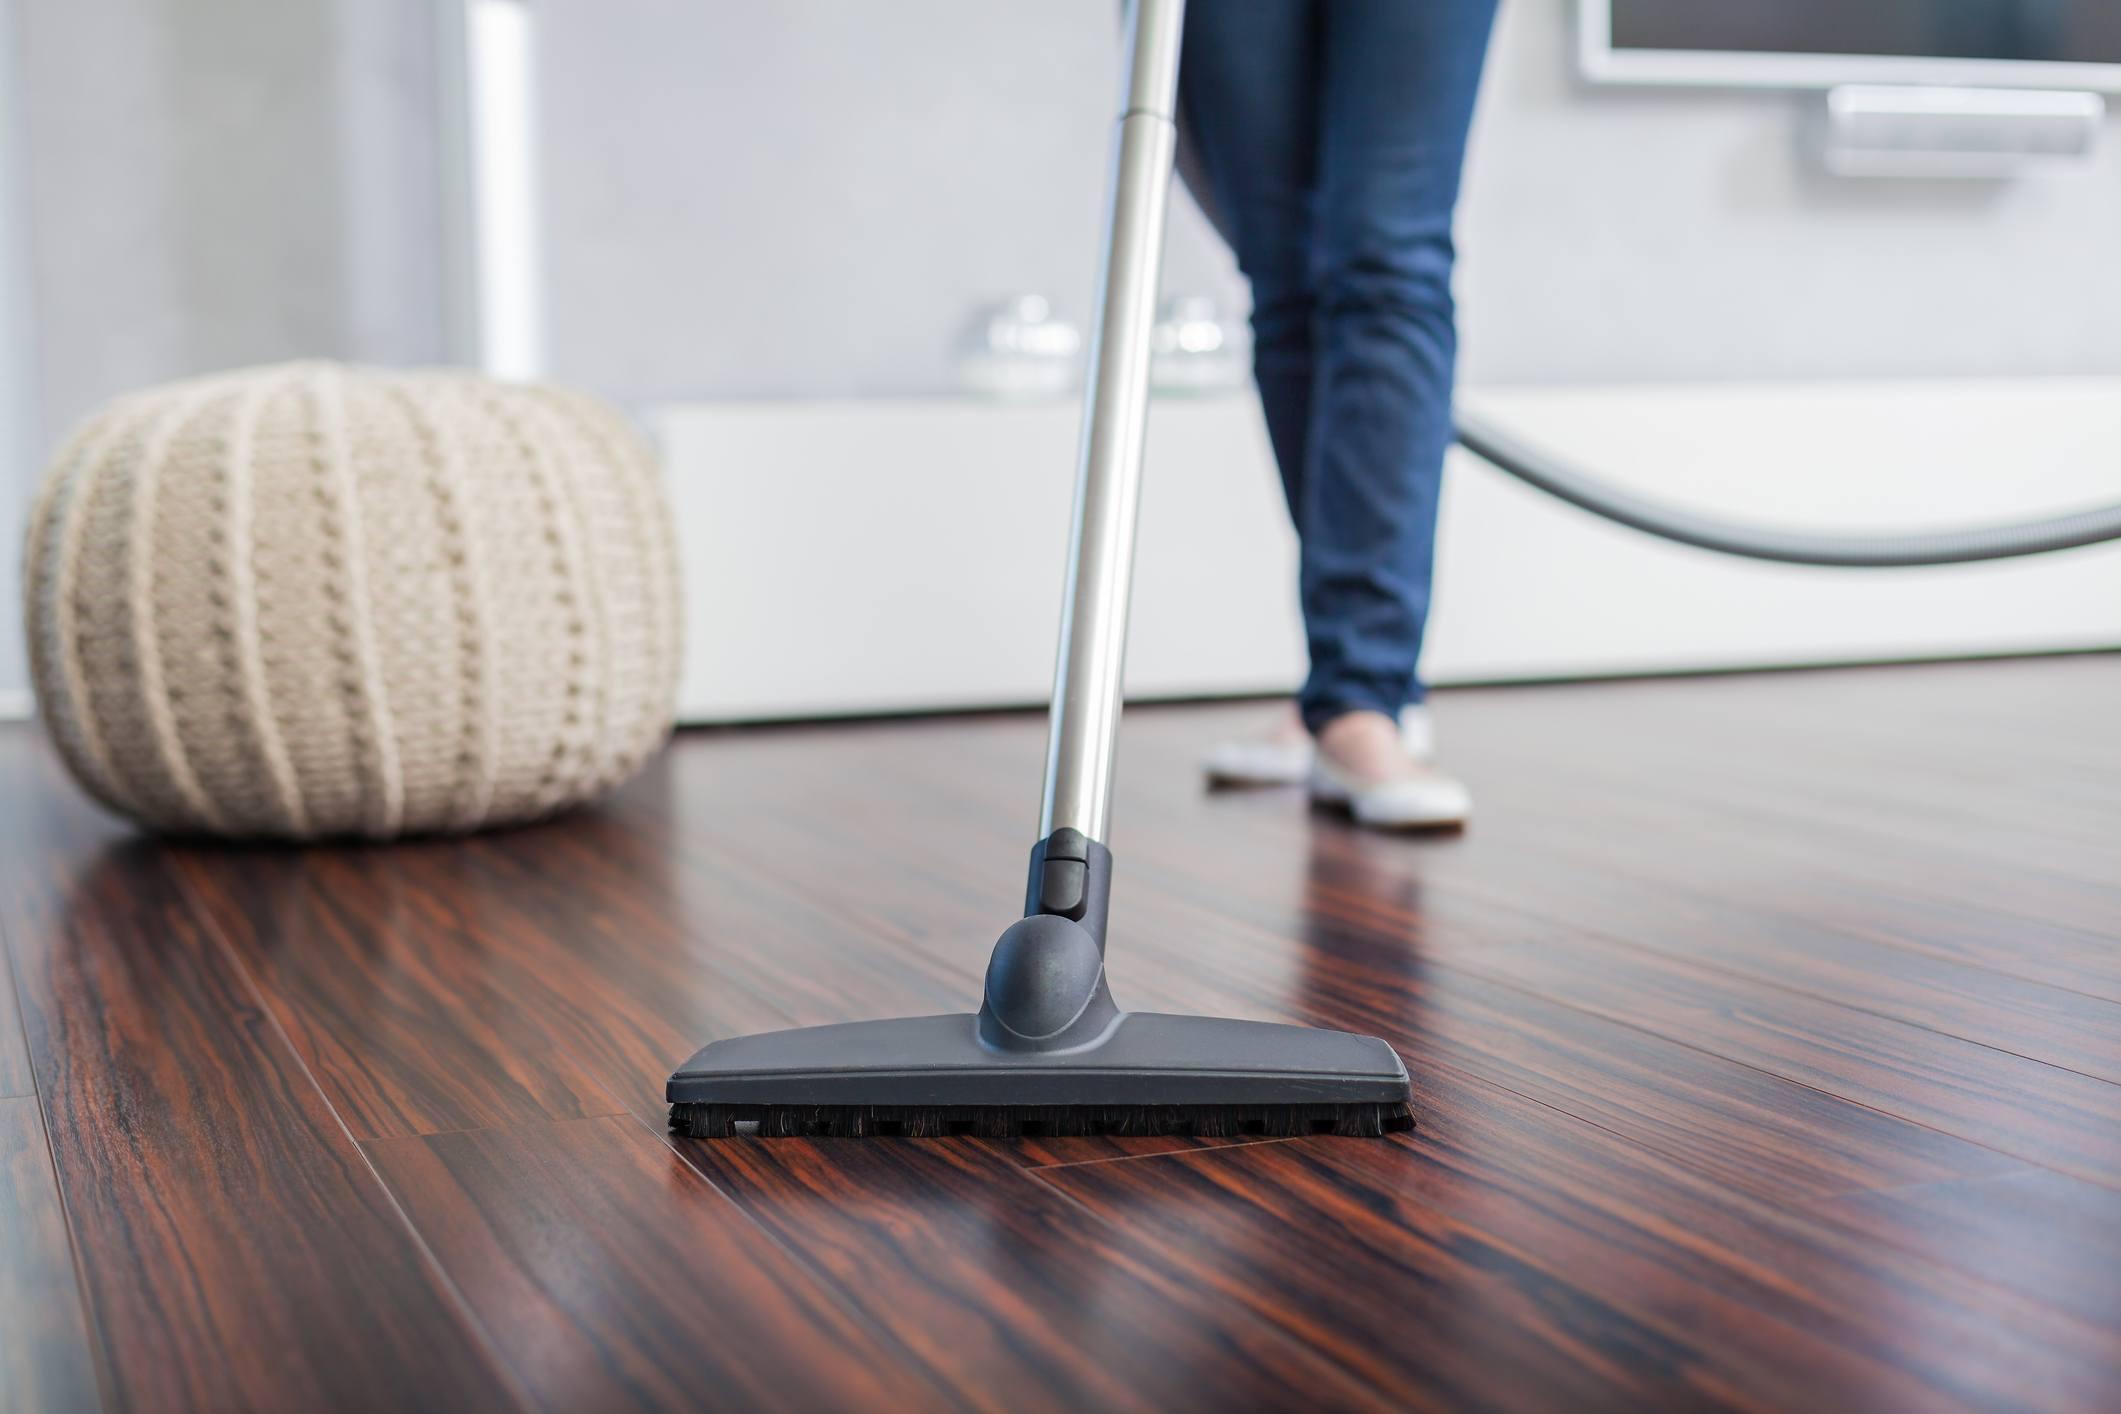 vacuuming a wood floor